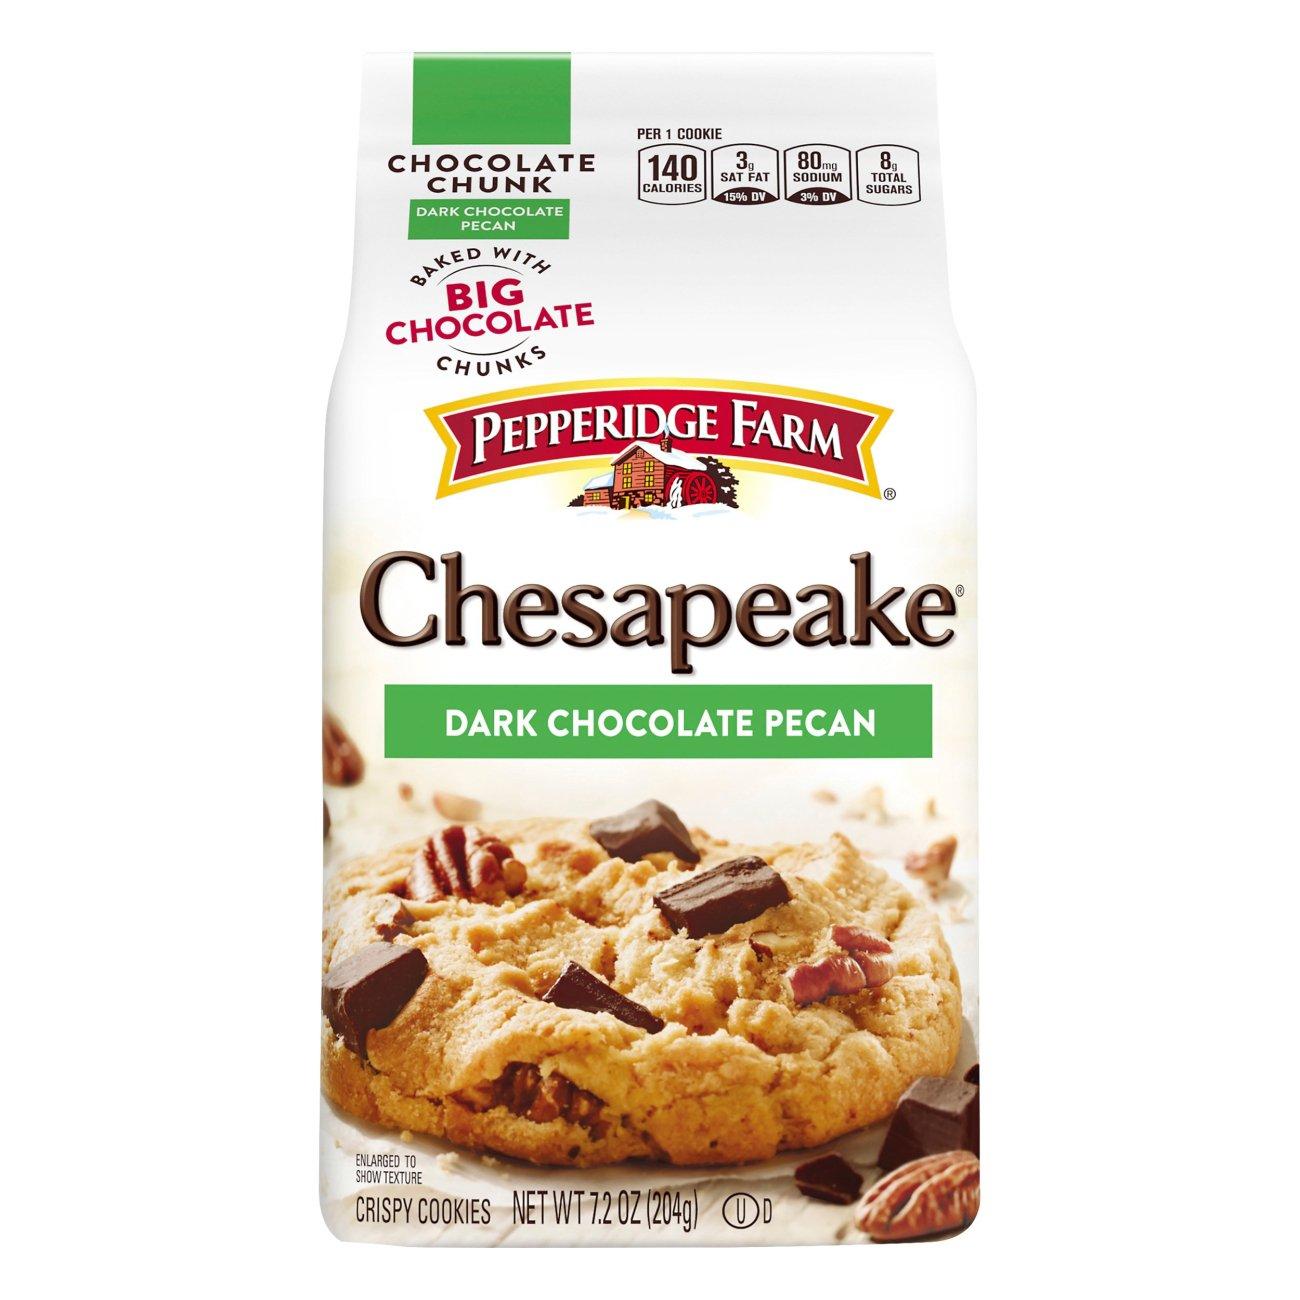 Pepperidge Farm Chesapeake Dark Chocolate Pecan Crispy Cookies Shop Cookies At H E B